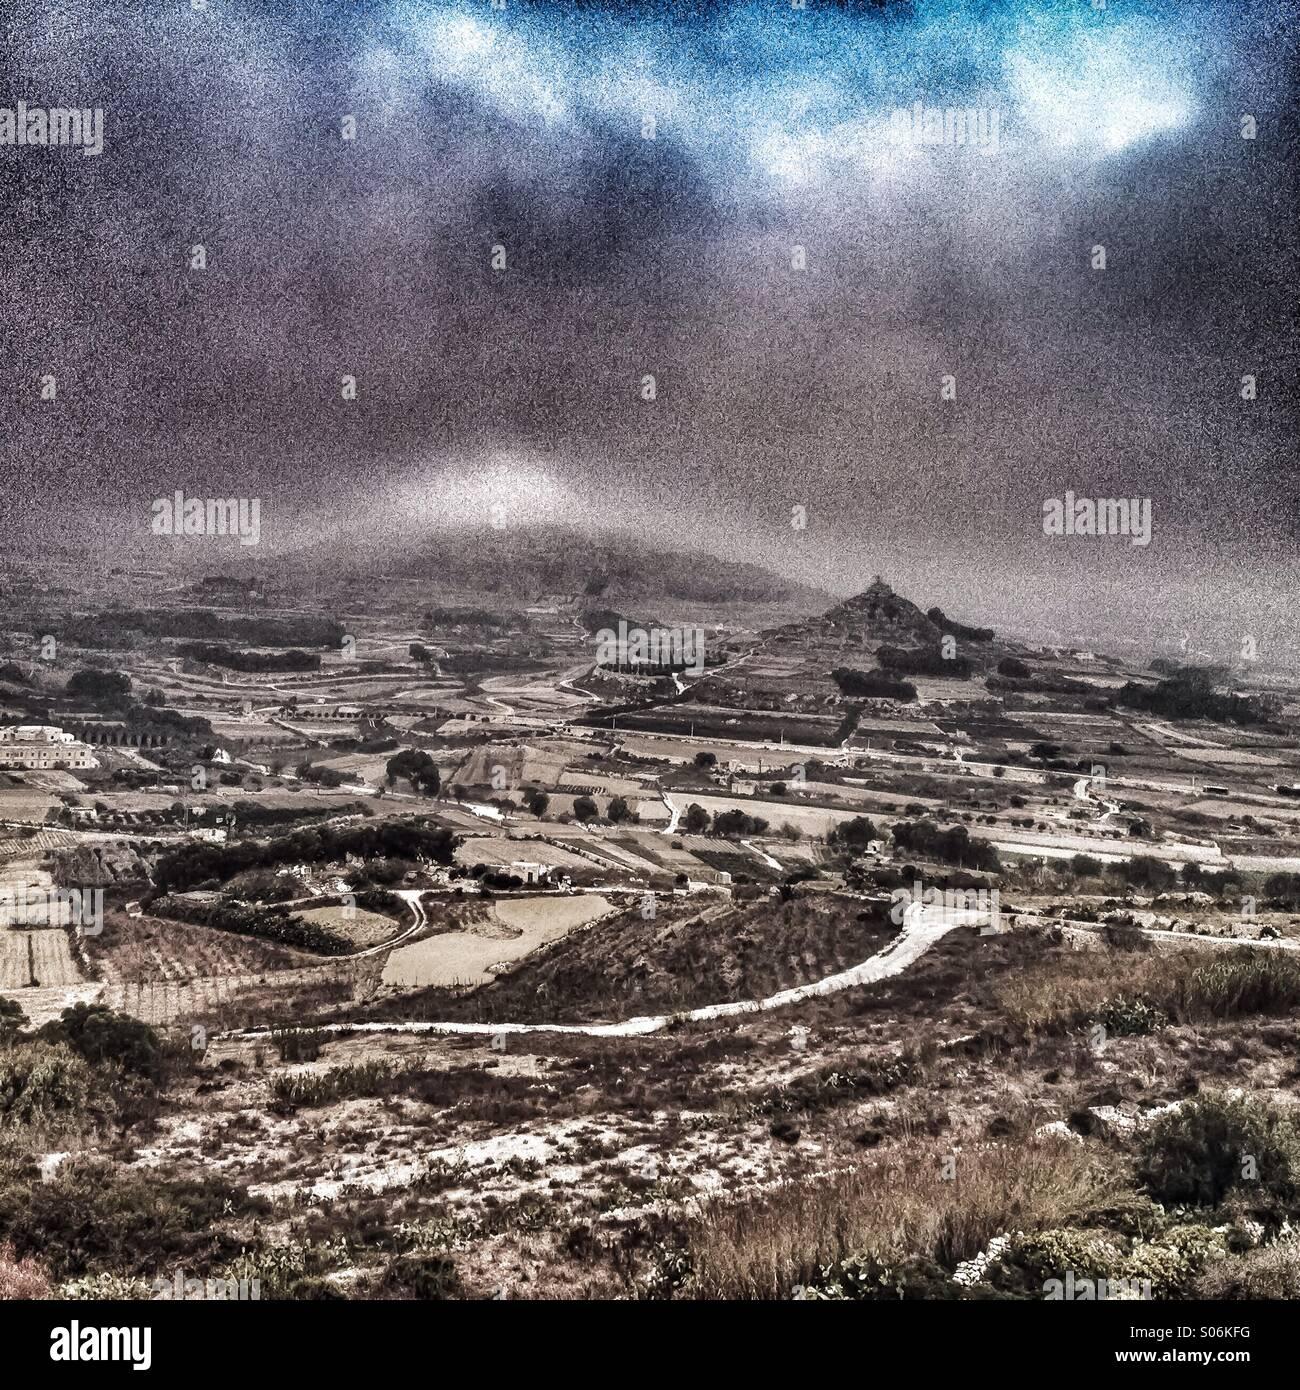 Autumn fog builds up on Mediterranean island - Stock Image